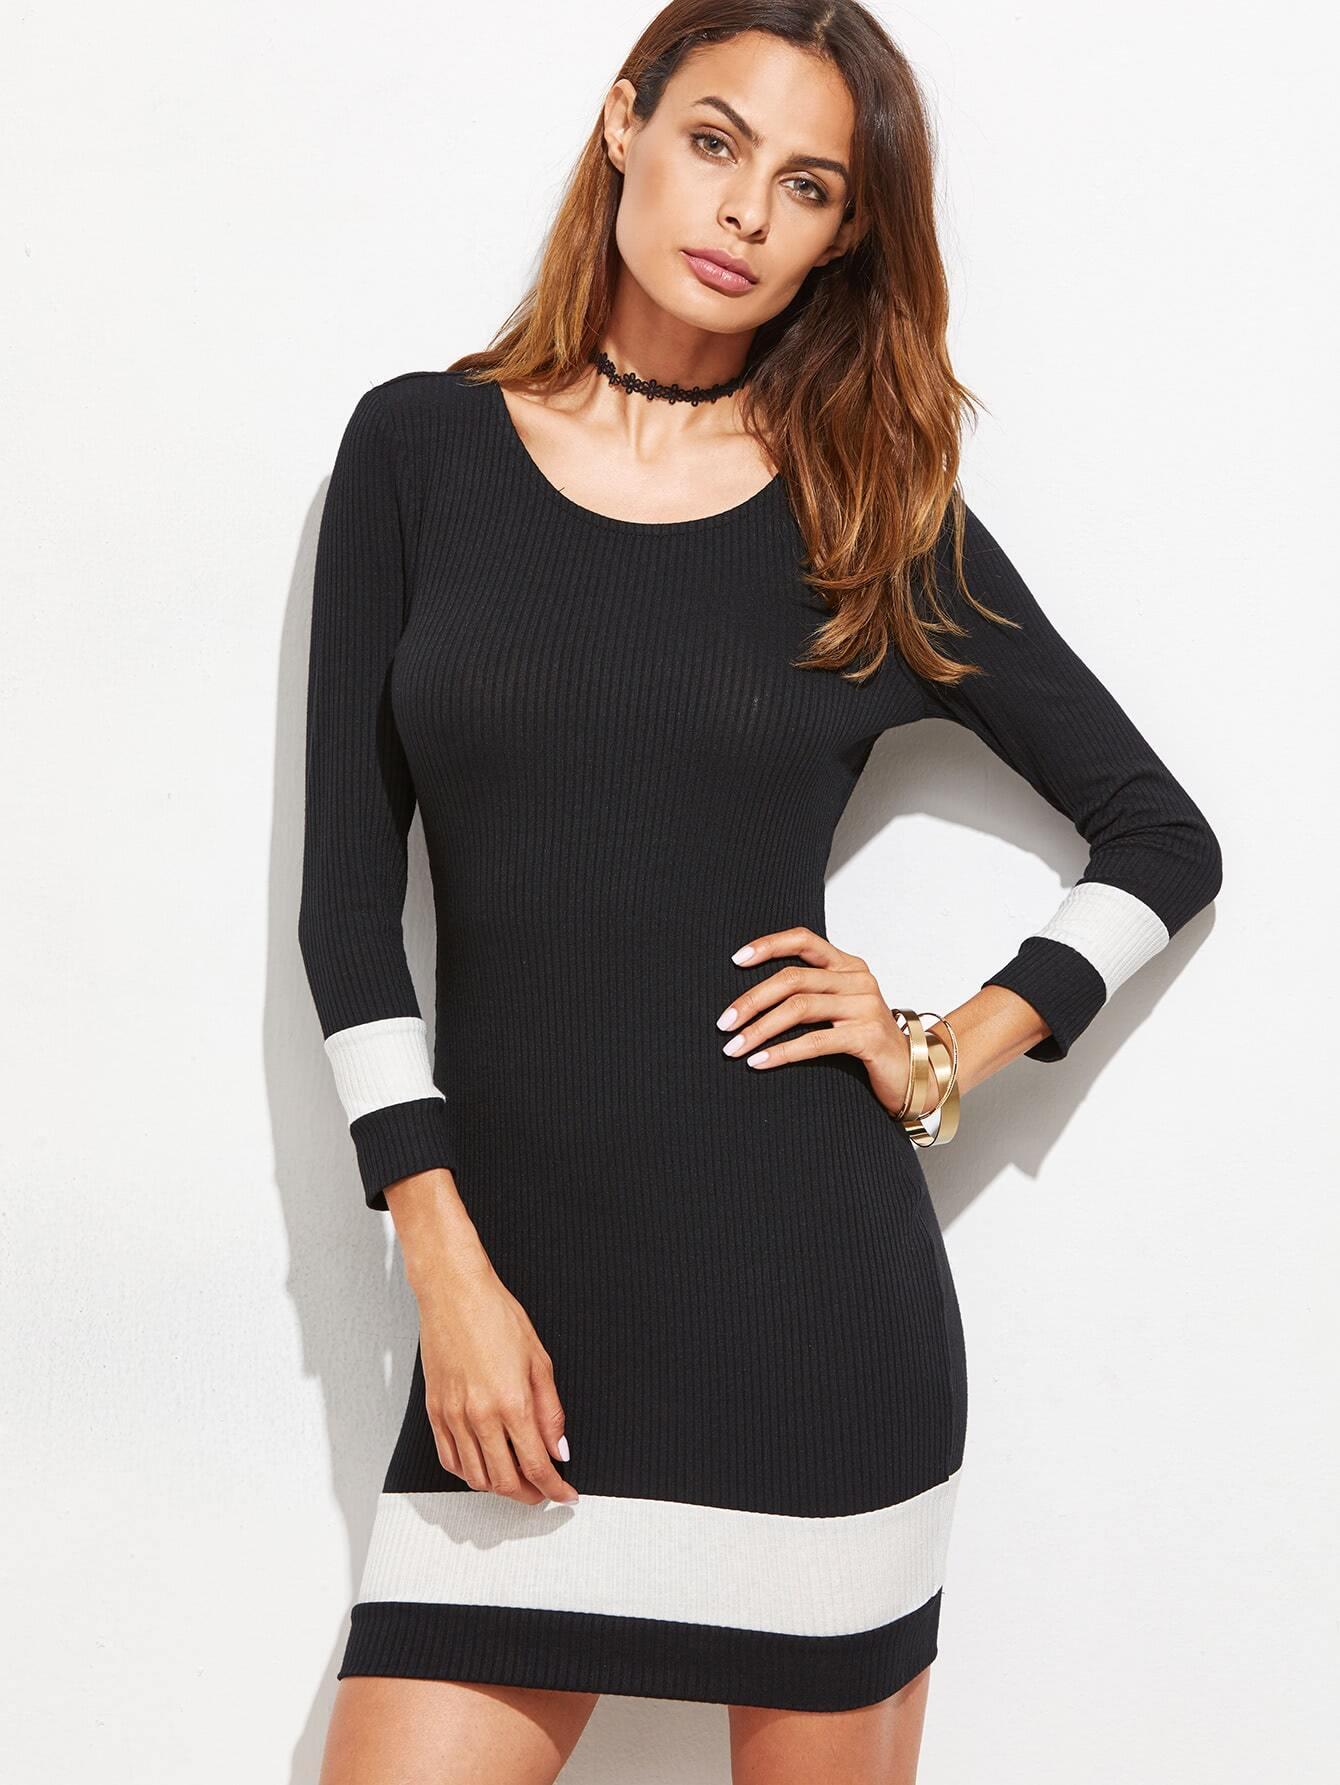 Black Contrast Panel Ribbed Bodycon Dress dress161019729